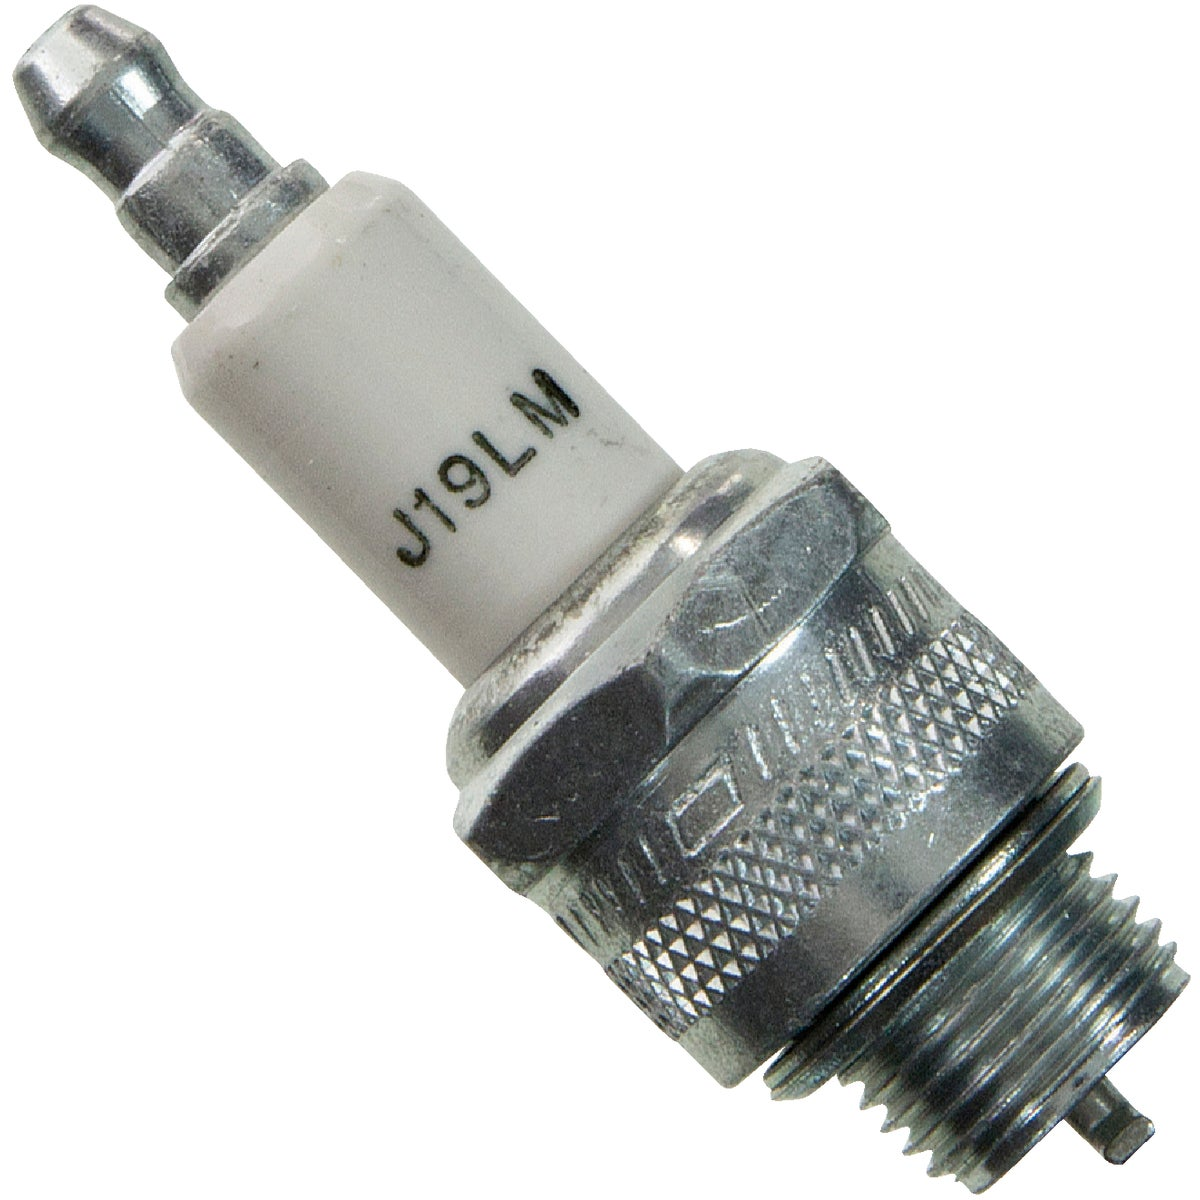 24PK J19LM SPARK PLUG - 861S by Federal Mogul